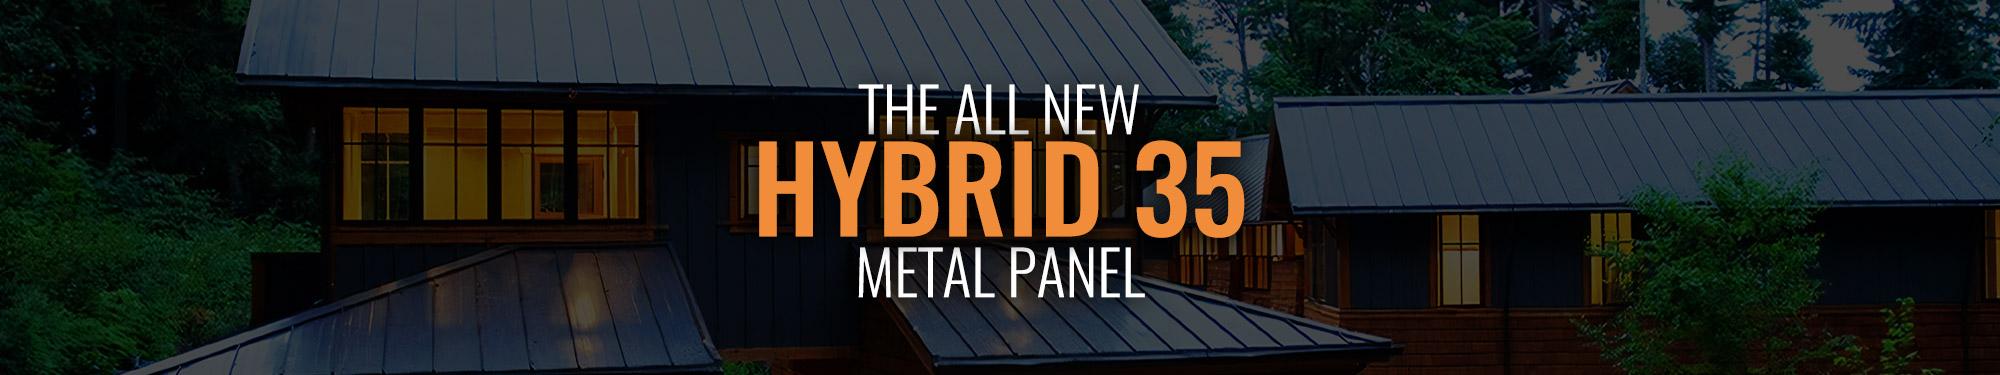 hybrid1-banner